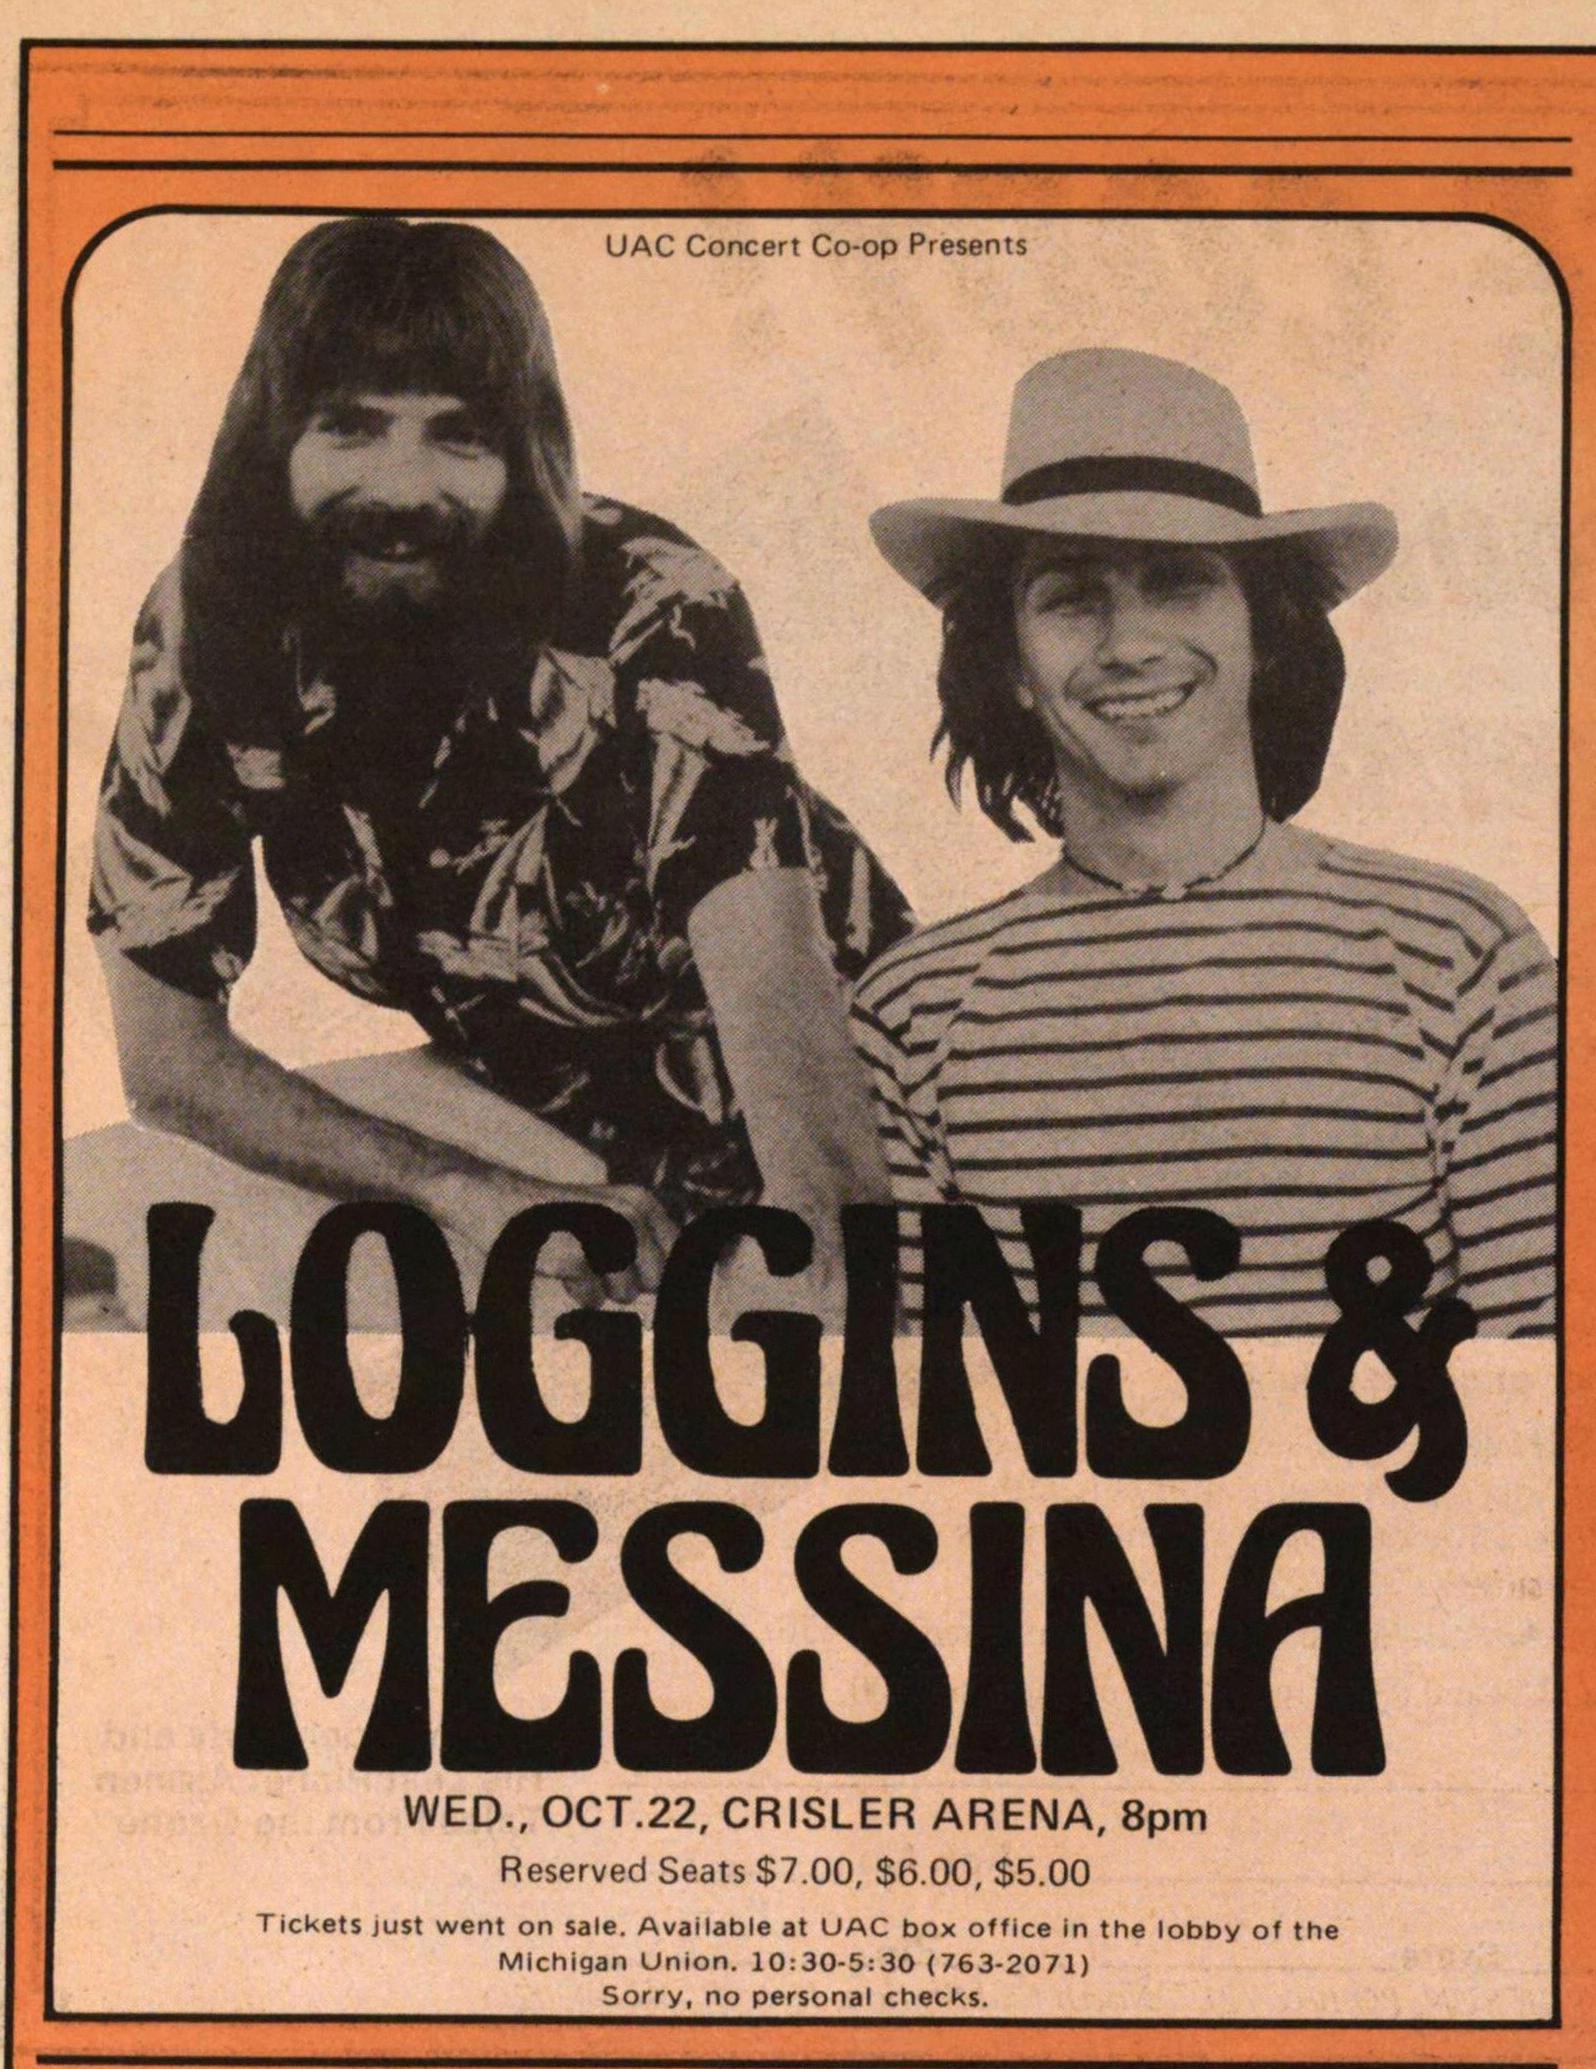 messina loggins setlist - photo#15